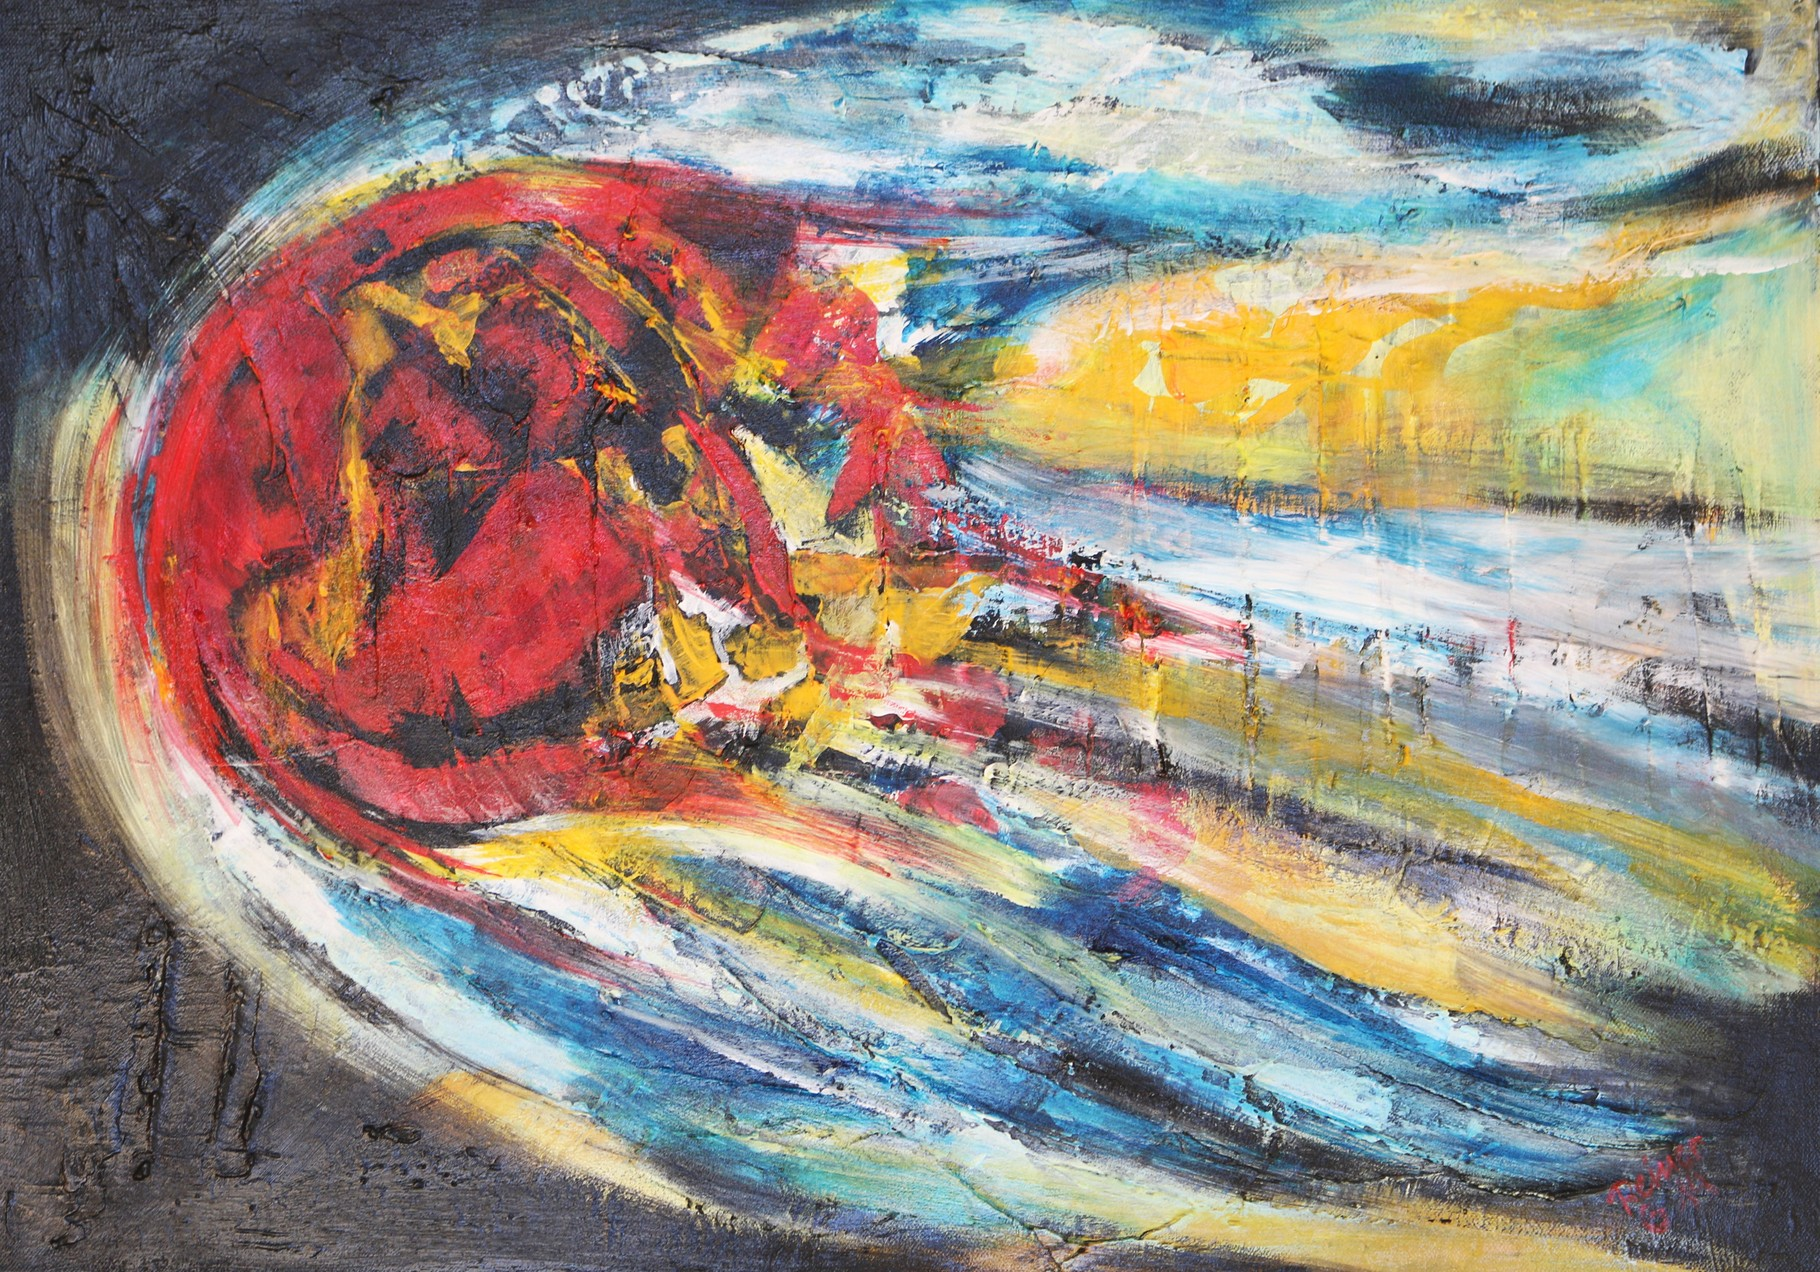 Komet, Oel auf Leinwand, 70 x 50 cm